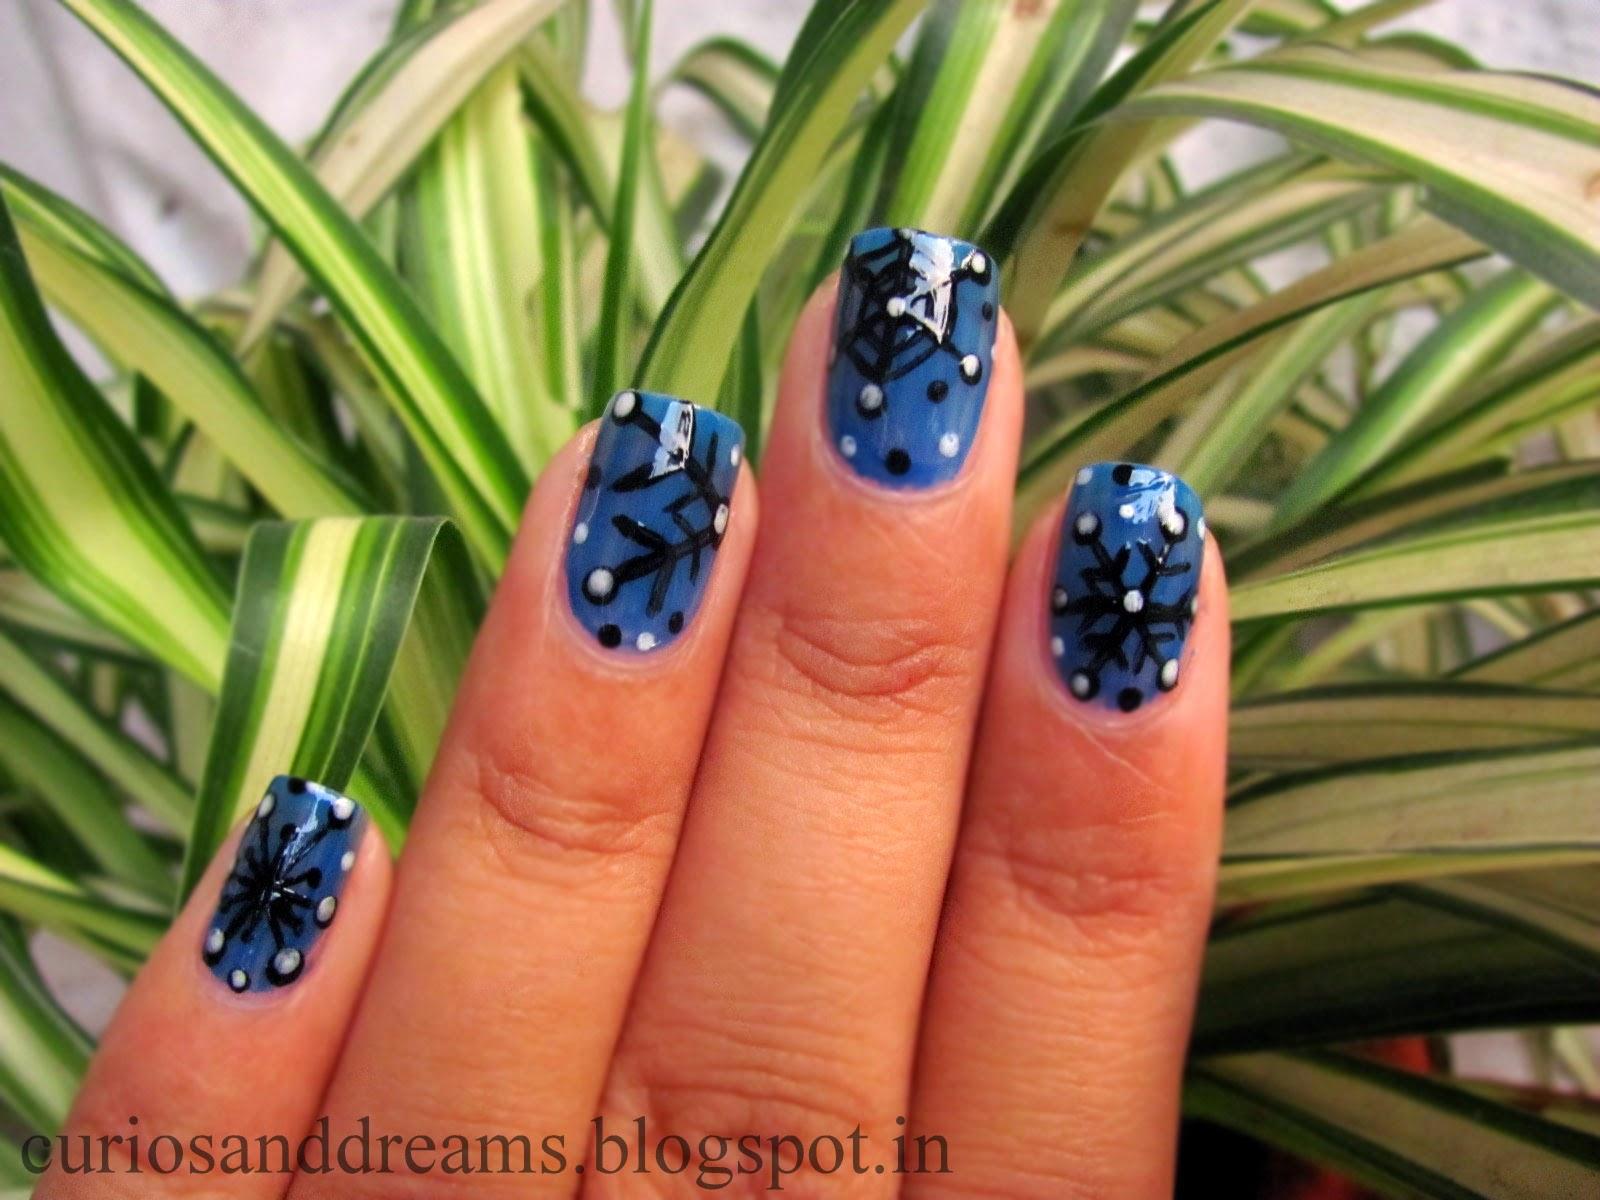 snowflake manicure, snowflake nailart, snowflake nailart design, christmas nailart design